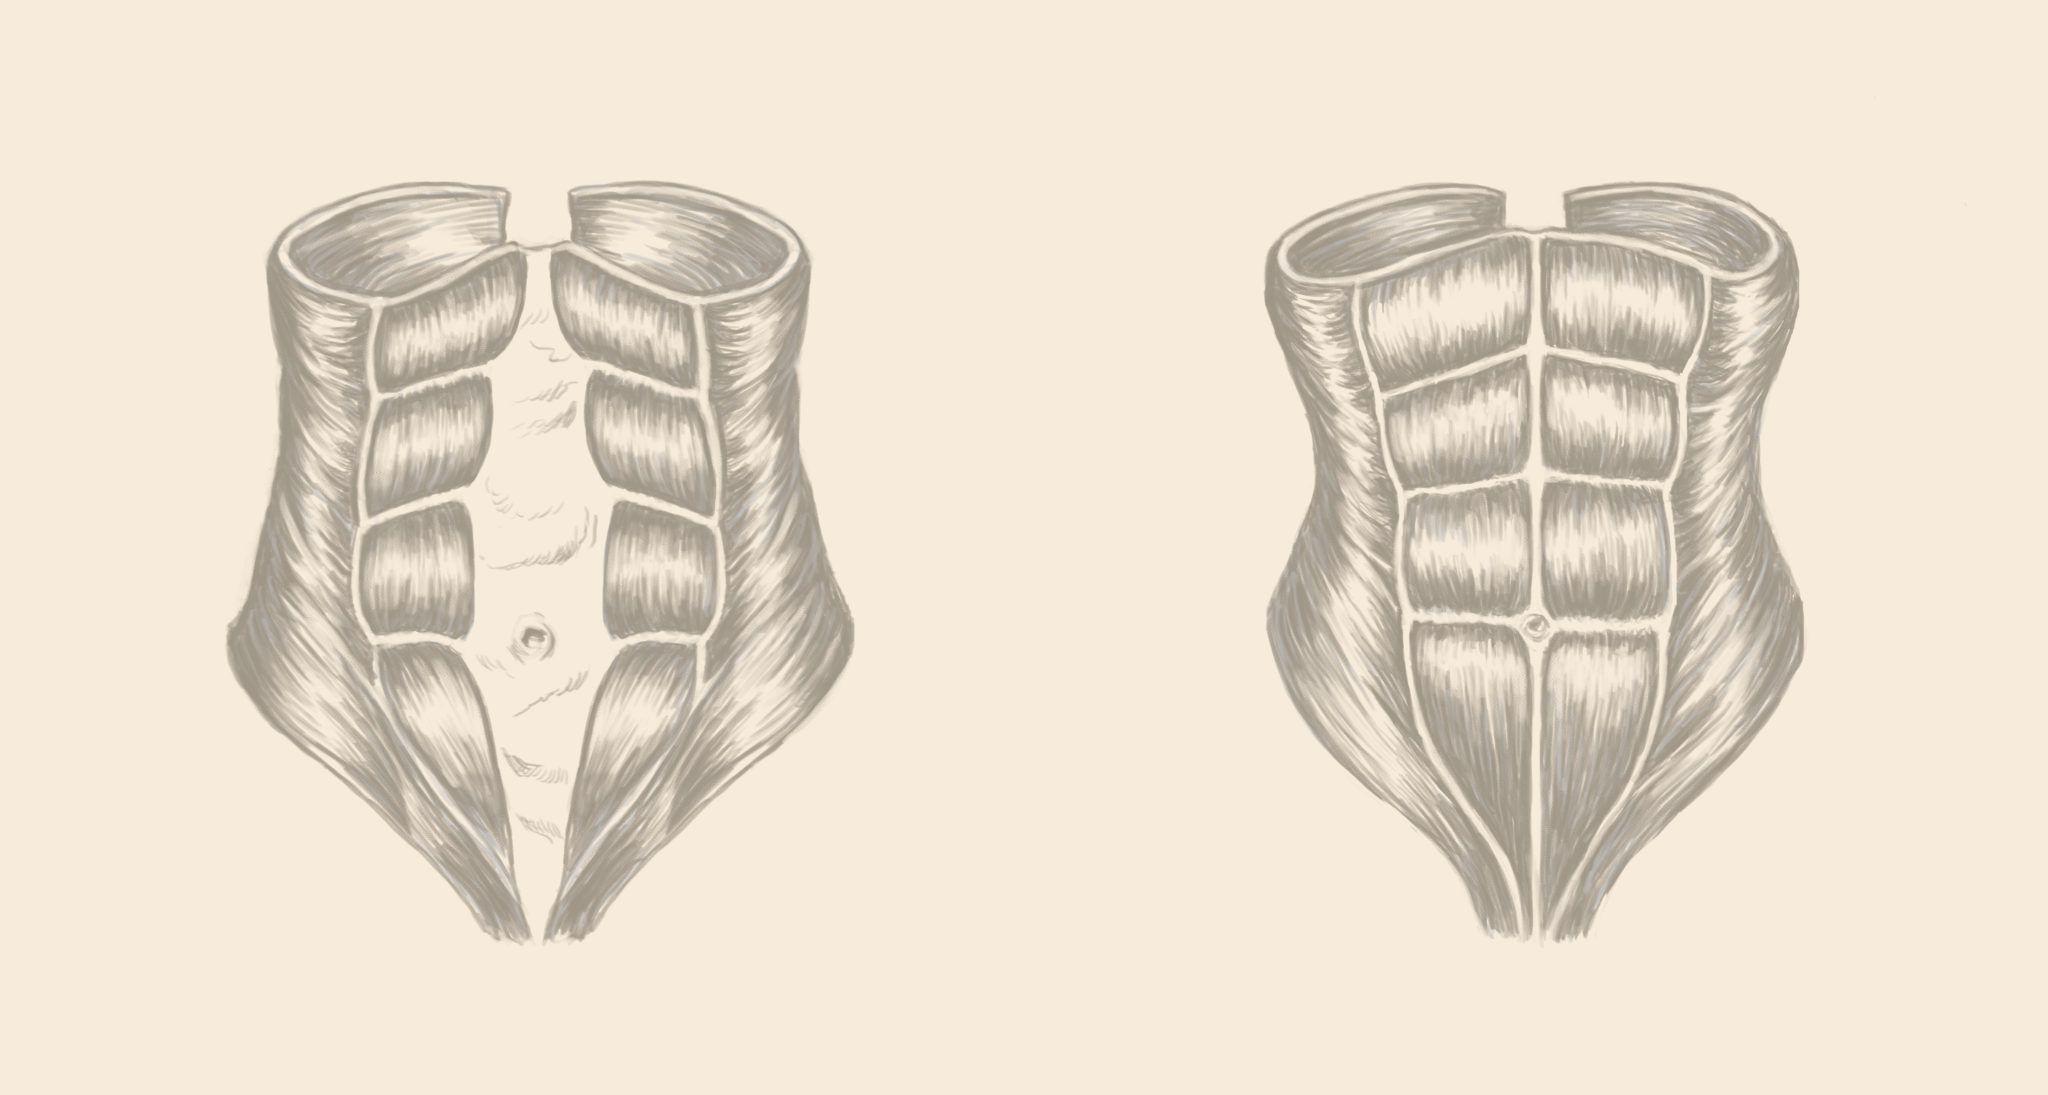 how to fix diastasis recti 3 years later